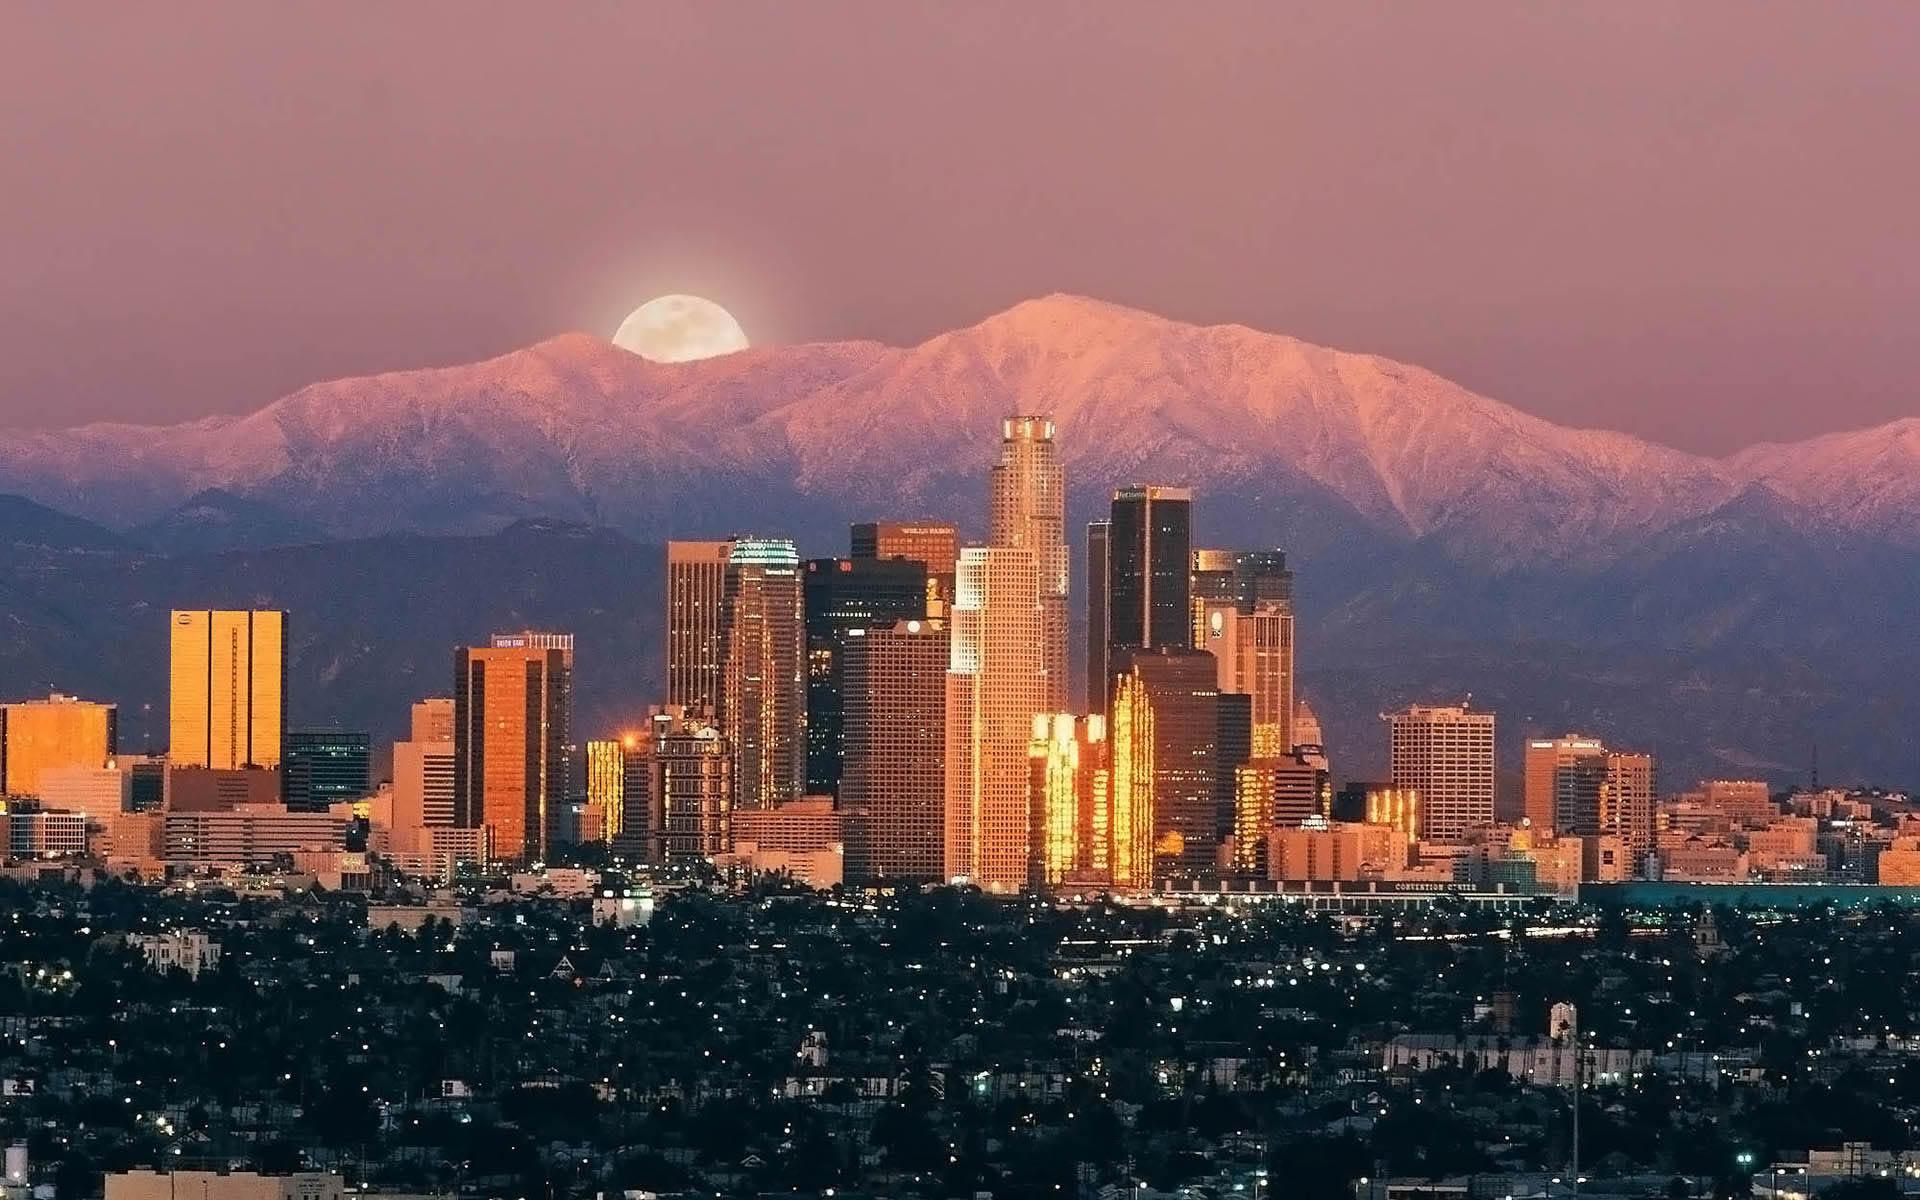 اهم 5 اماكن سياحية في لوس انجلوس